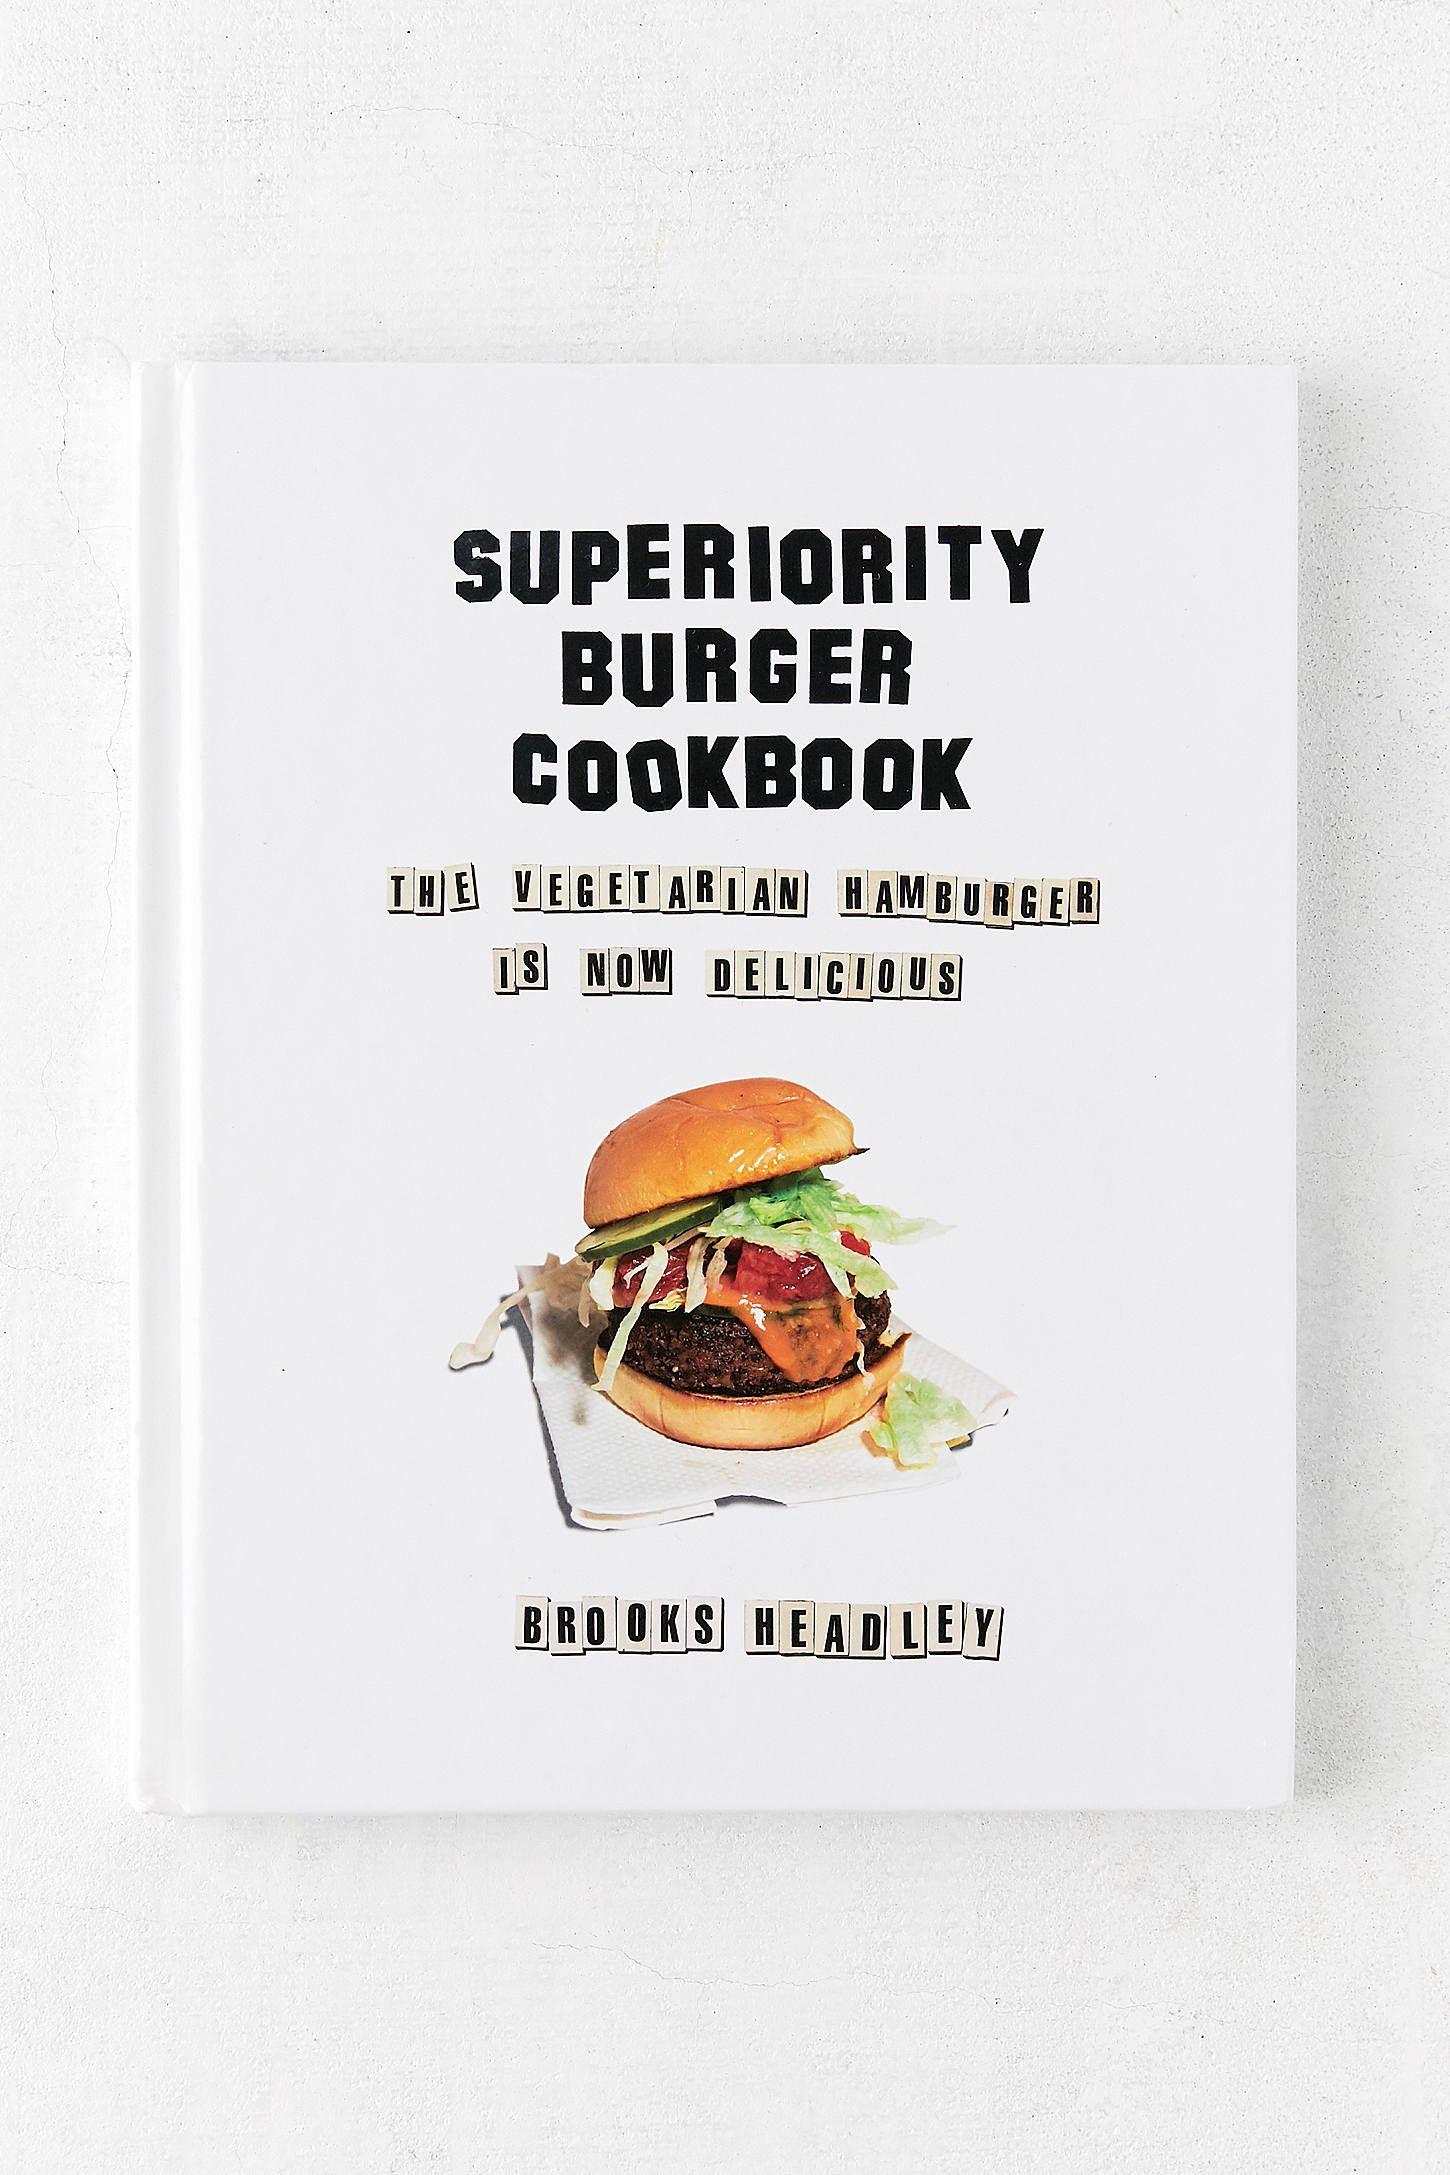 Superiority Burger Cookbook The Vegetarian Hamburger Is Now